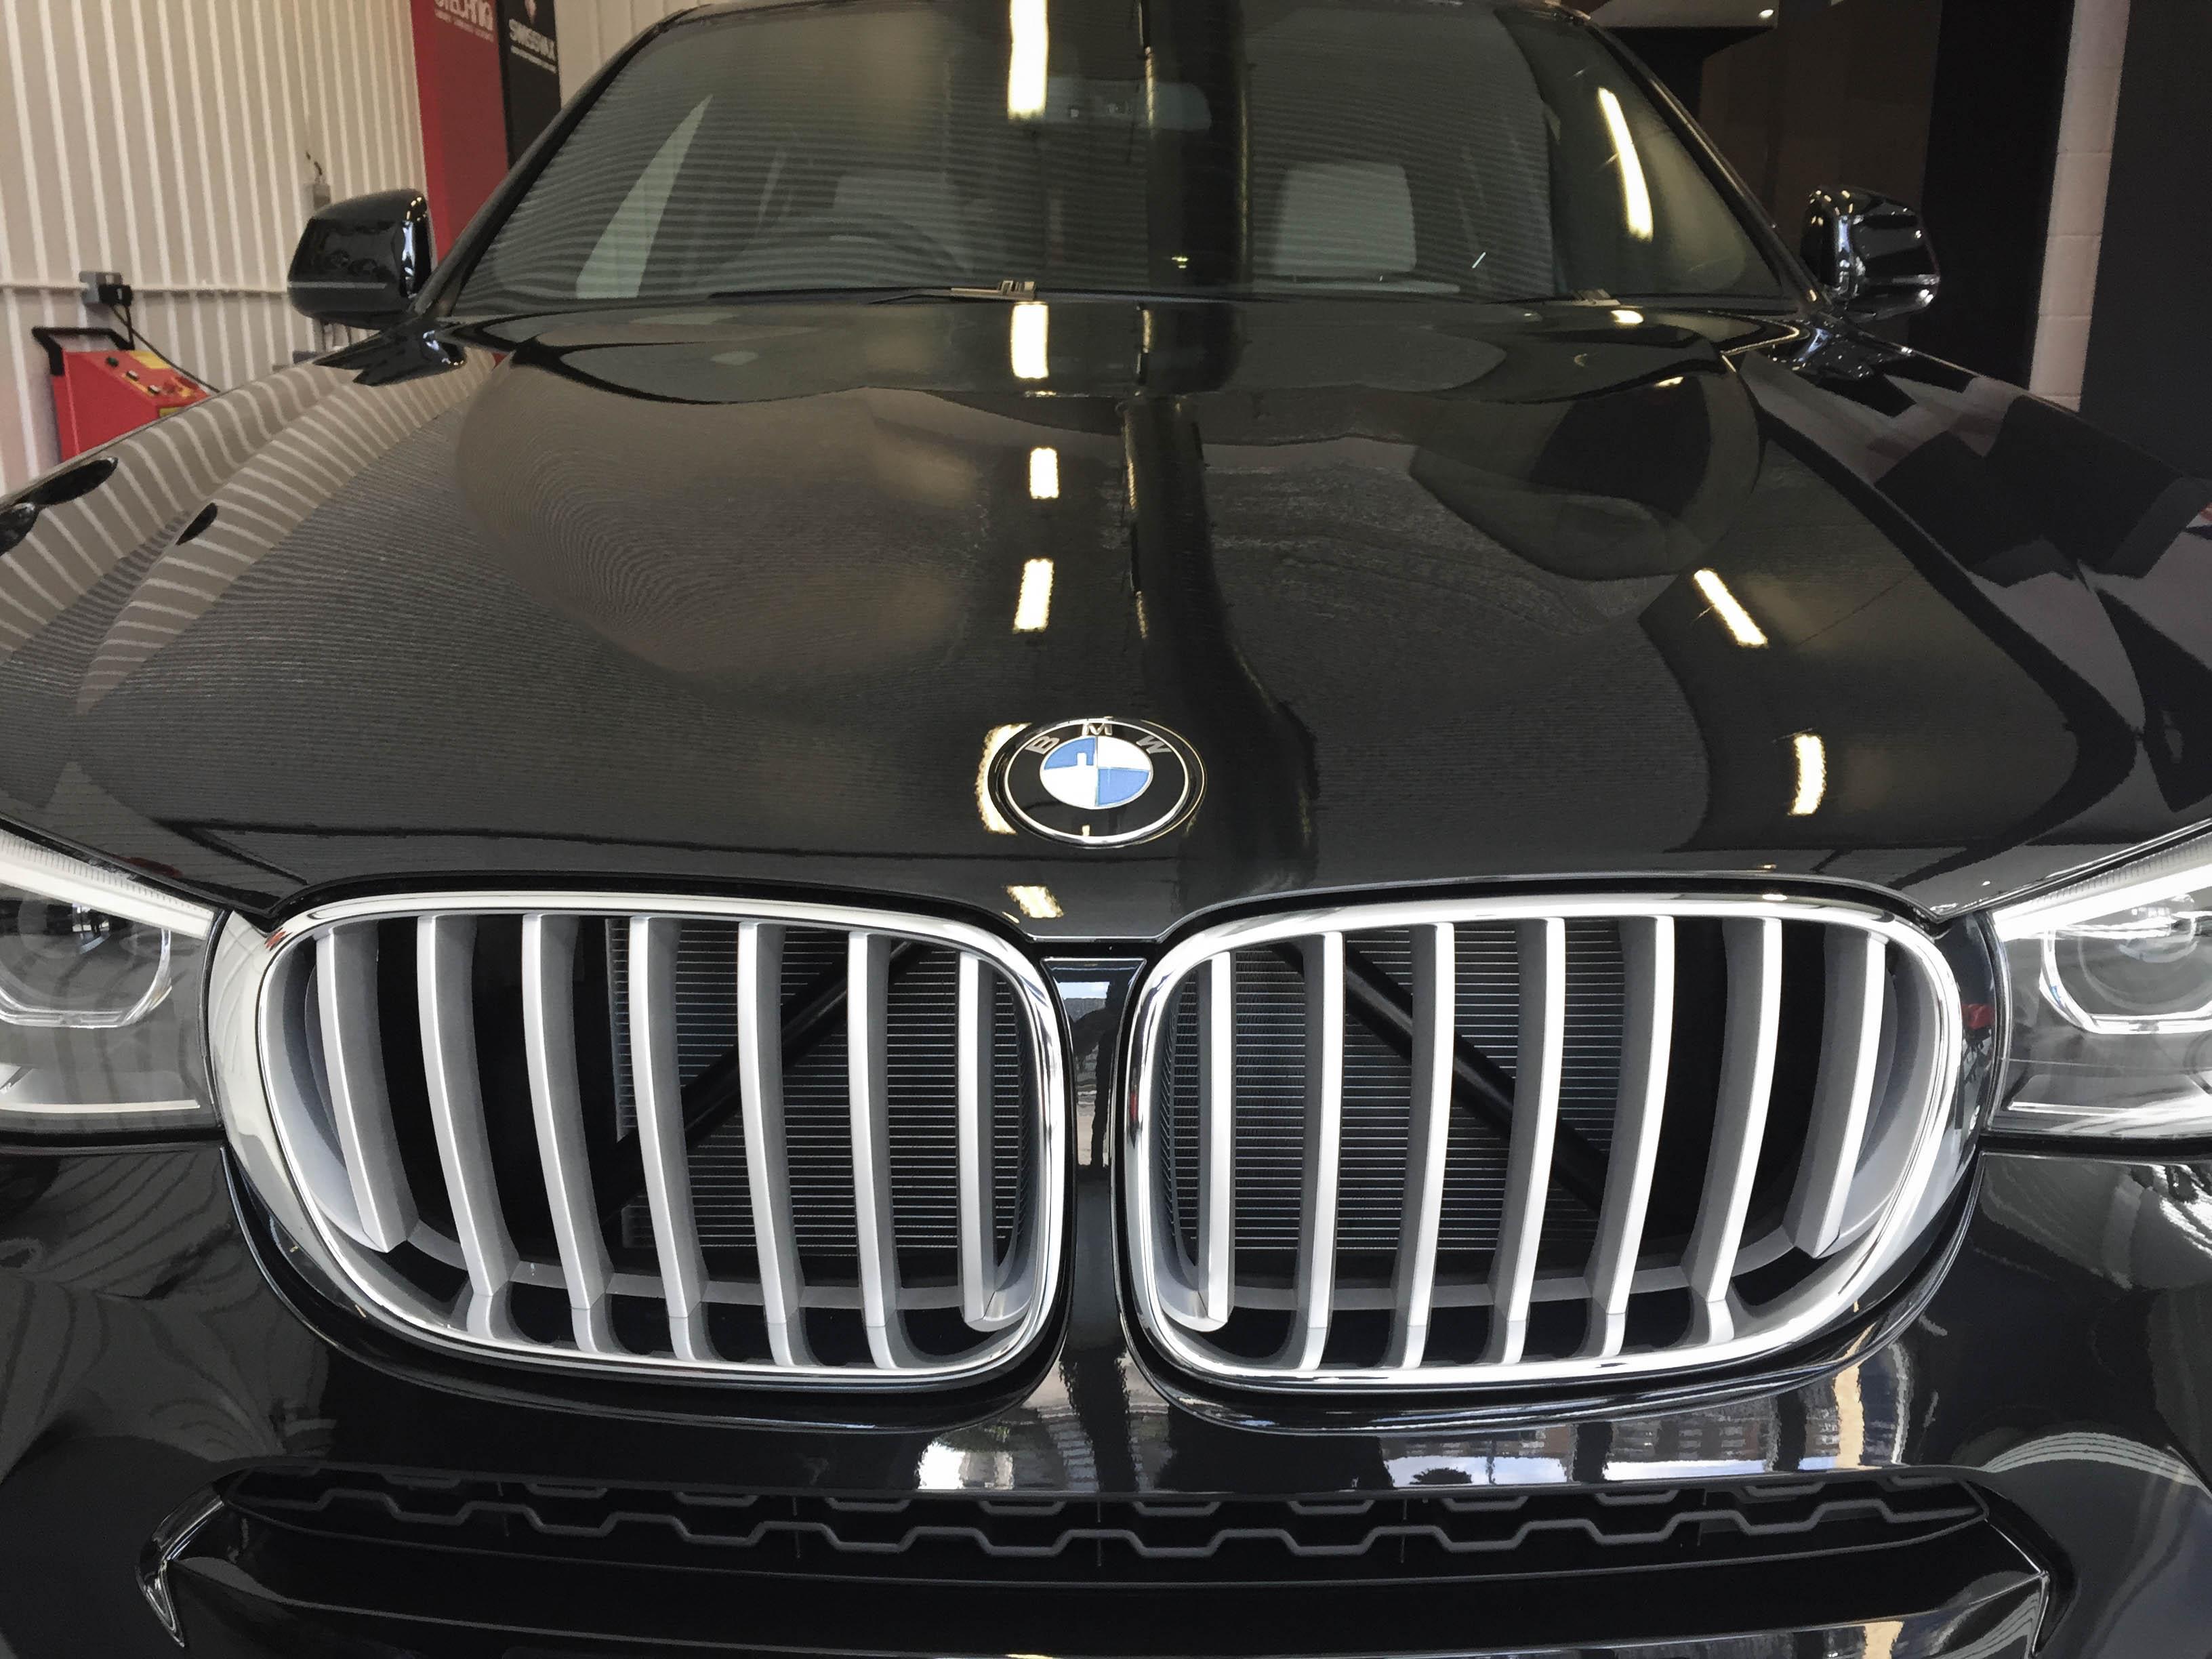 BMW X4 –Grill